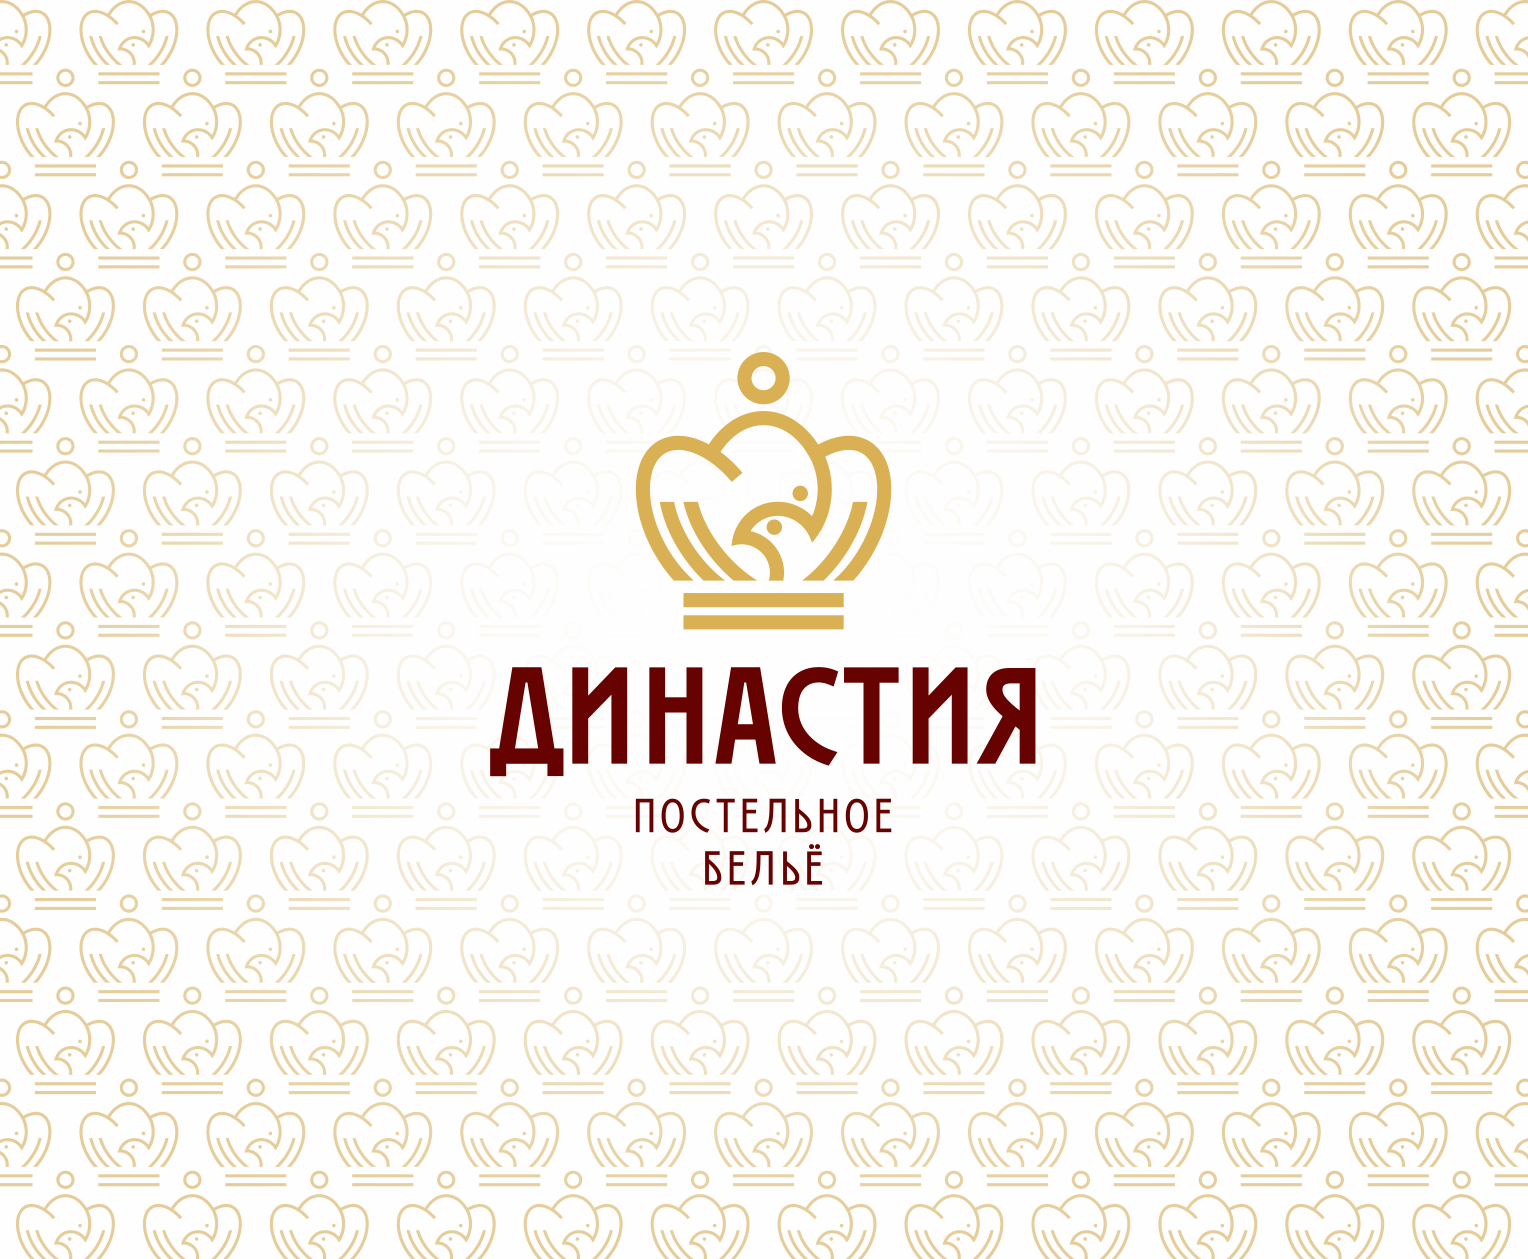 Разработать логотип для нового бренда фото f_05159e44e5a4630d.png